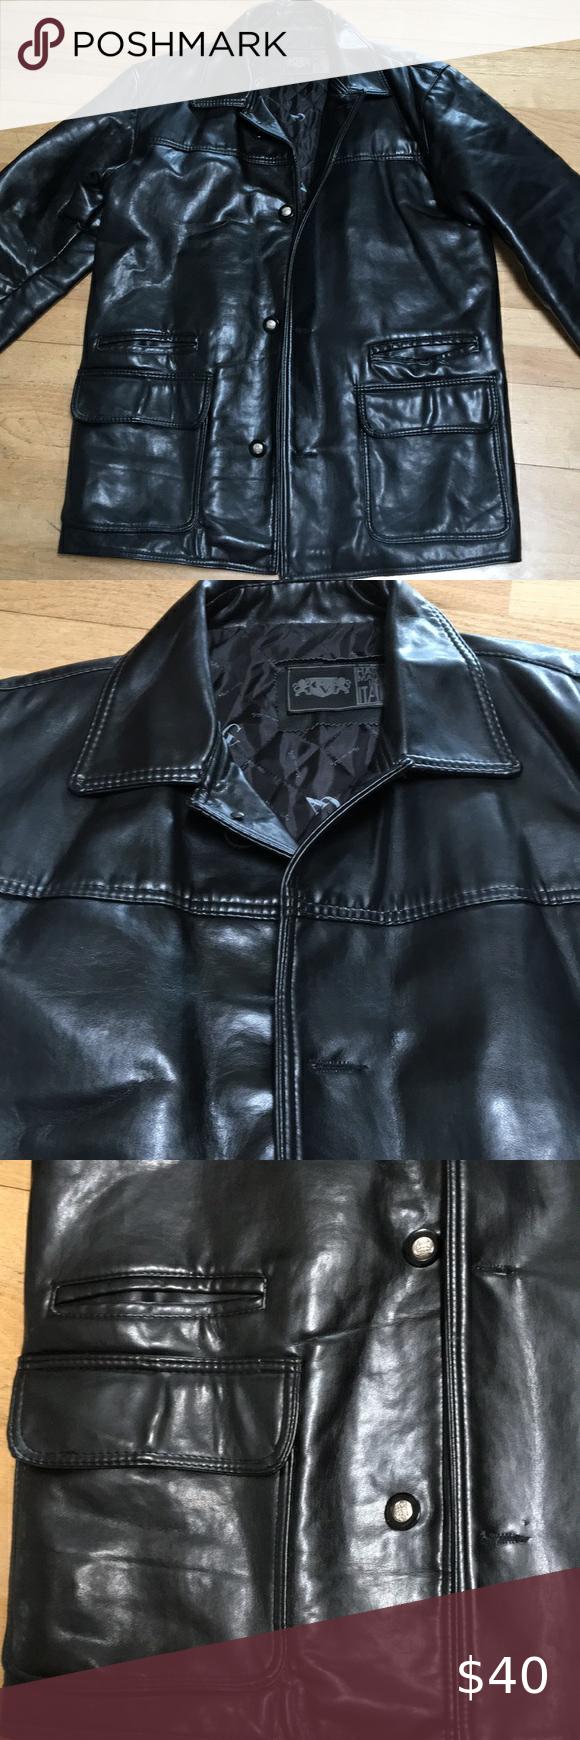 Men S Black Faux Leather Coat Jacket Made Italy L Leather Coat Jacket Faux Leather Coat Leather Coat [ 1740 x 580 Pixel ]